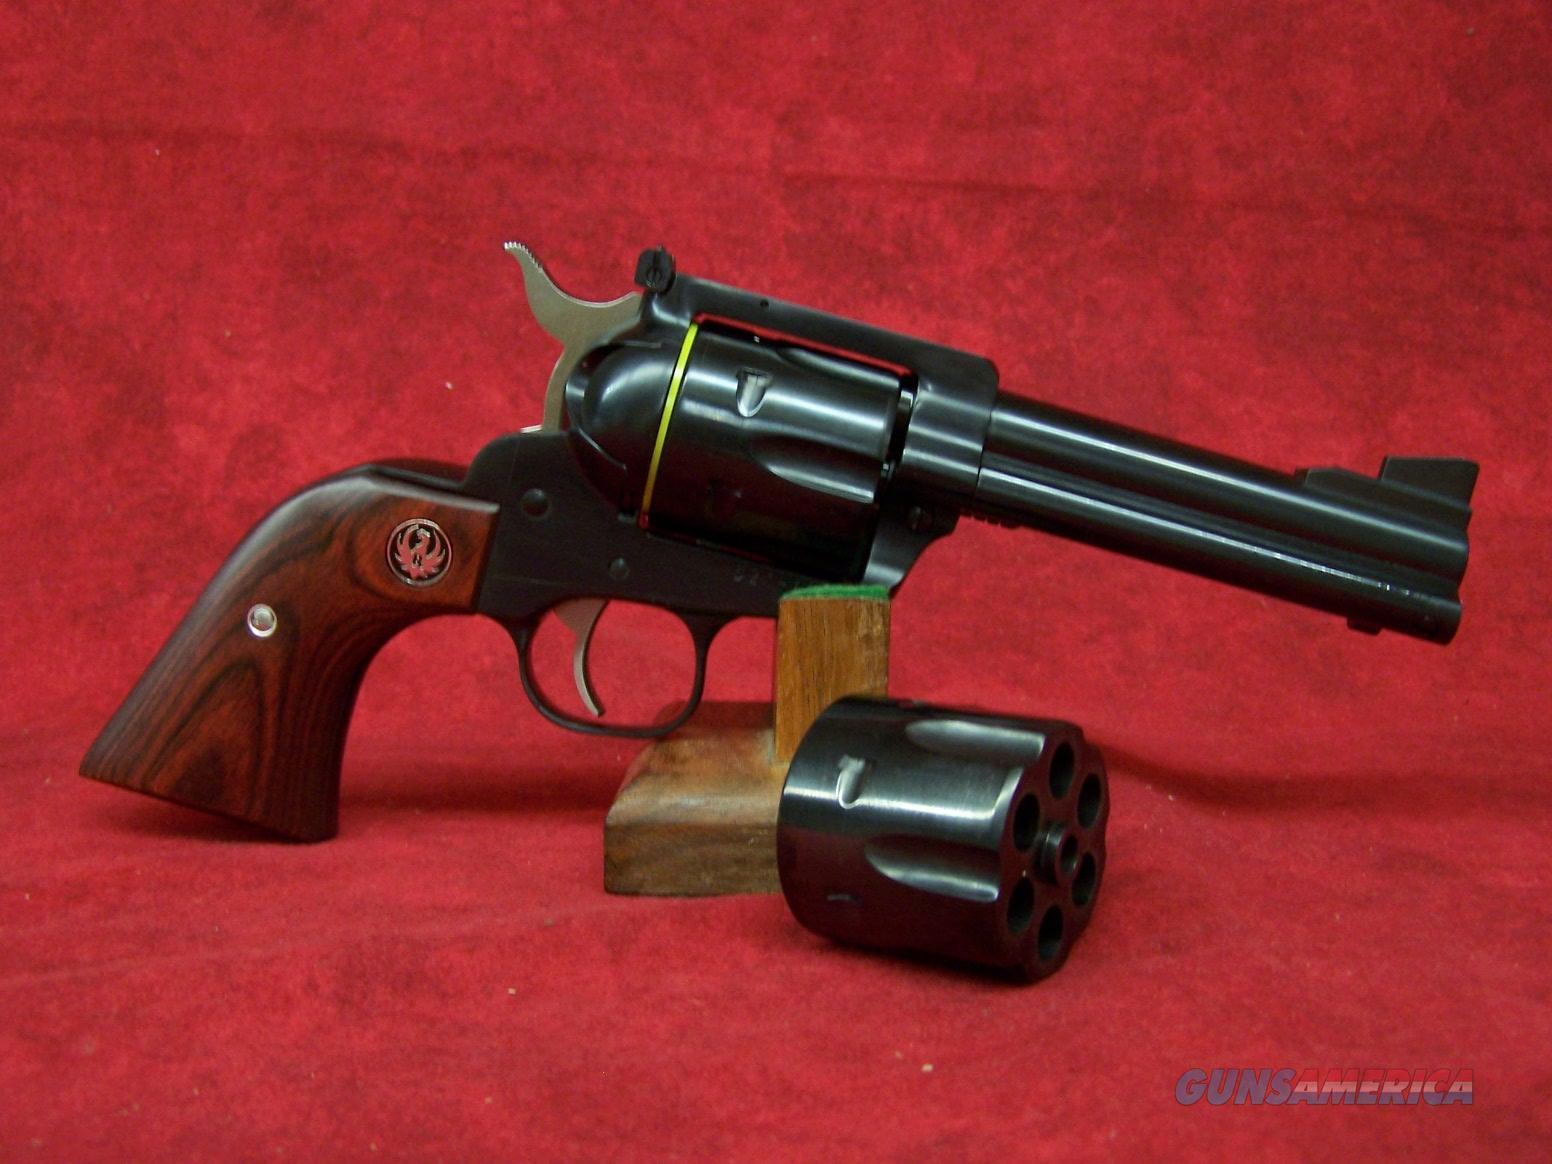 "Ruger New Model Blackhawk Flattop 357/9MM Blue/WD 4 5/8"""" barrel (05244)   Guns > Pistols > Ruger Single Action Revolvers > Blackhawk Type"